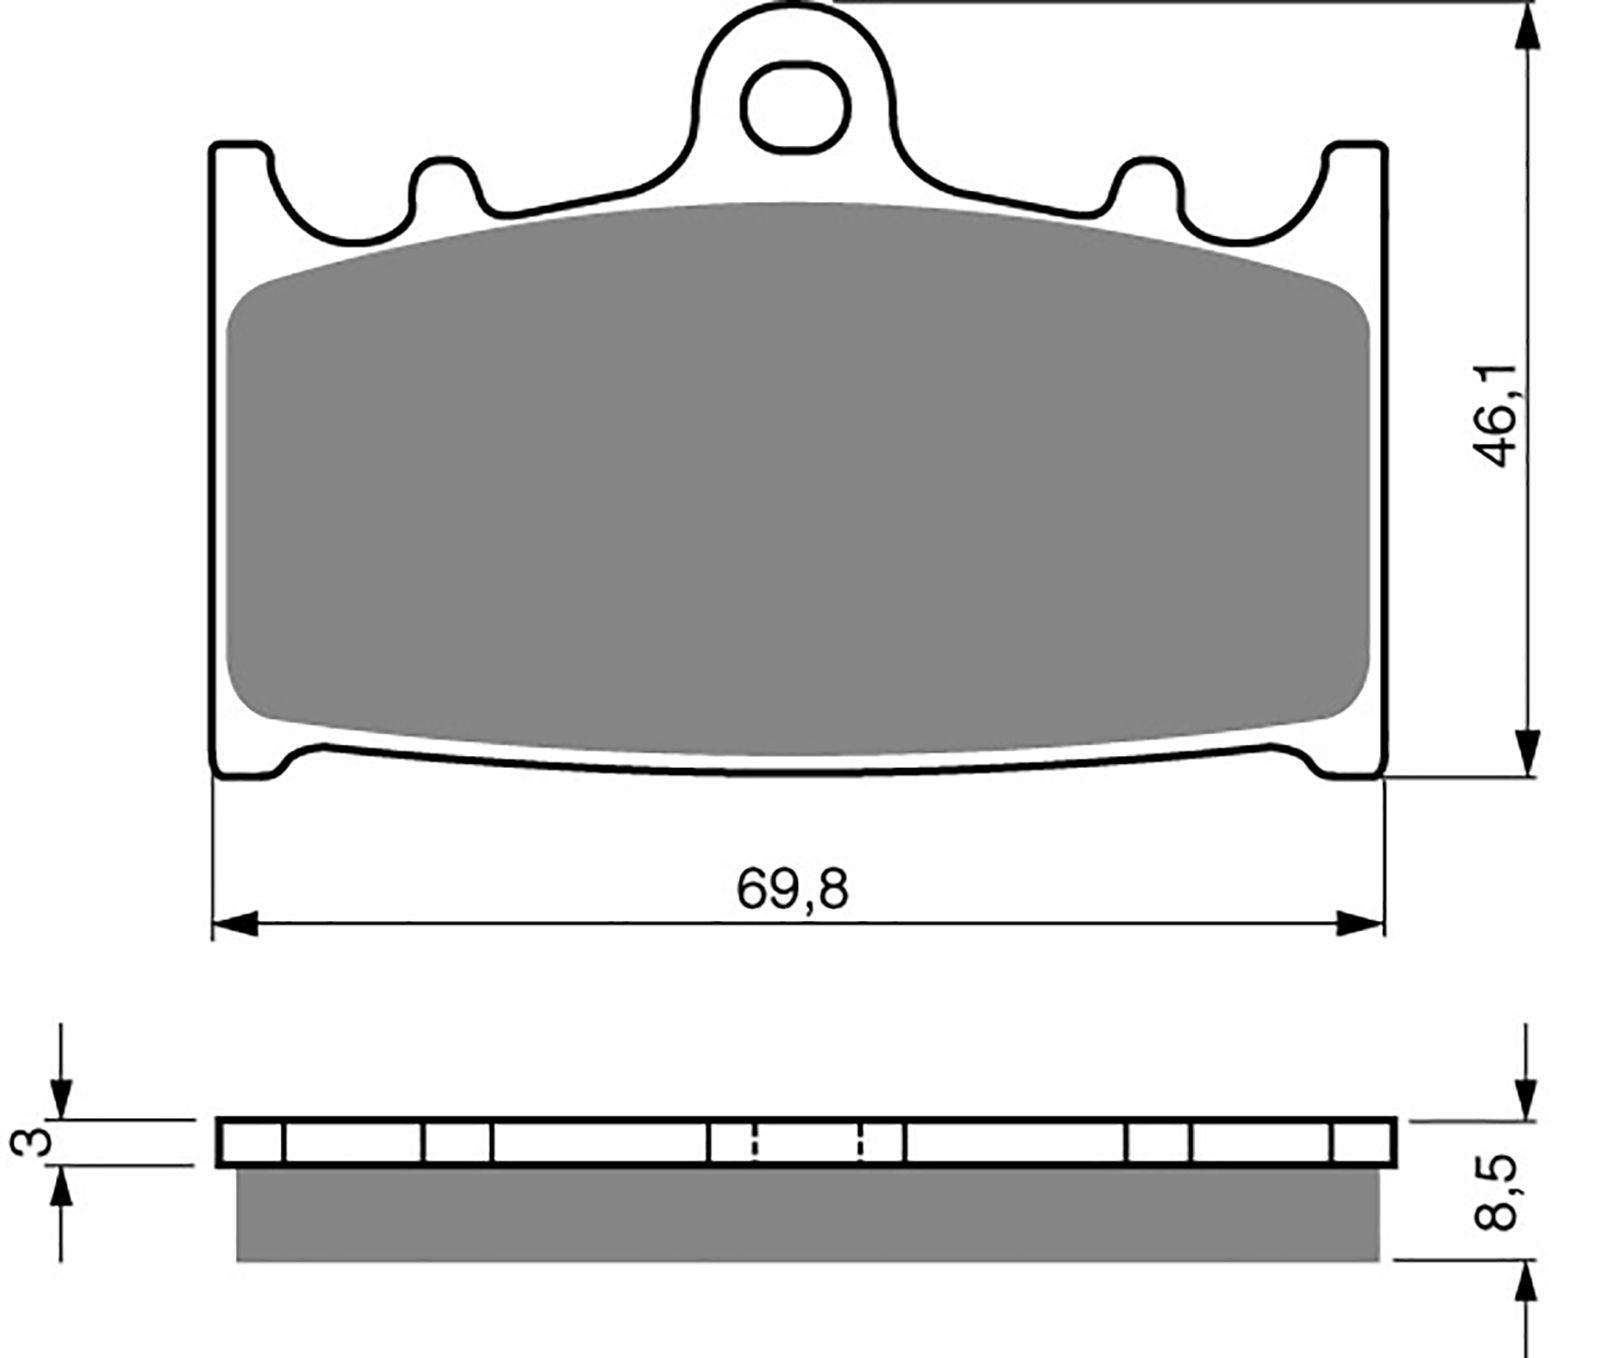 goldfren s33 brake pads - 700032GS image